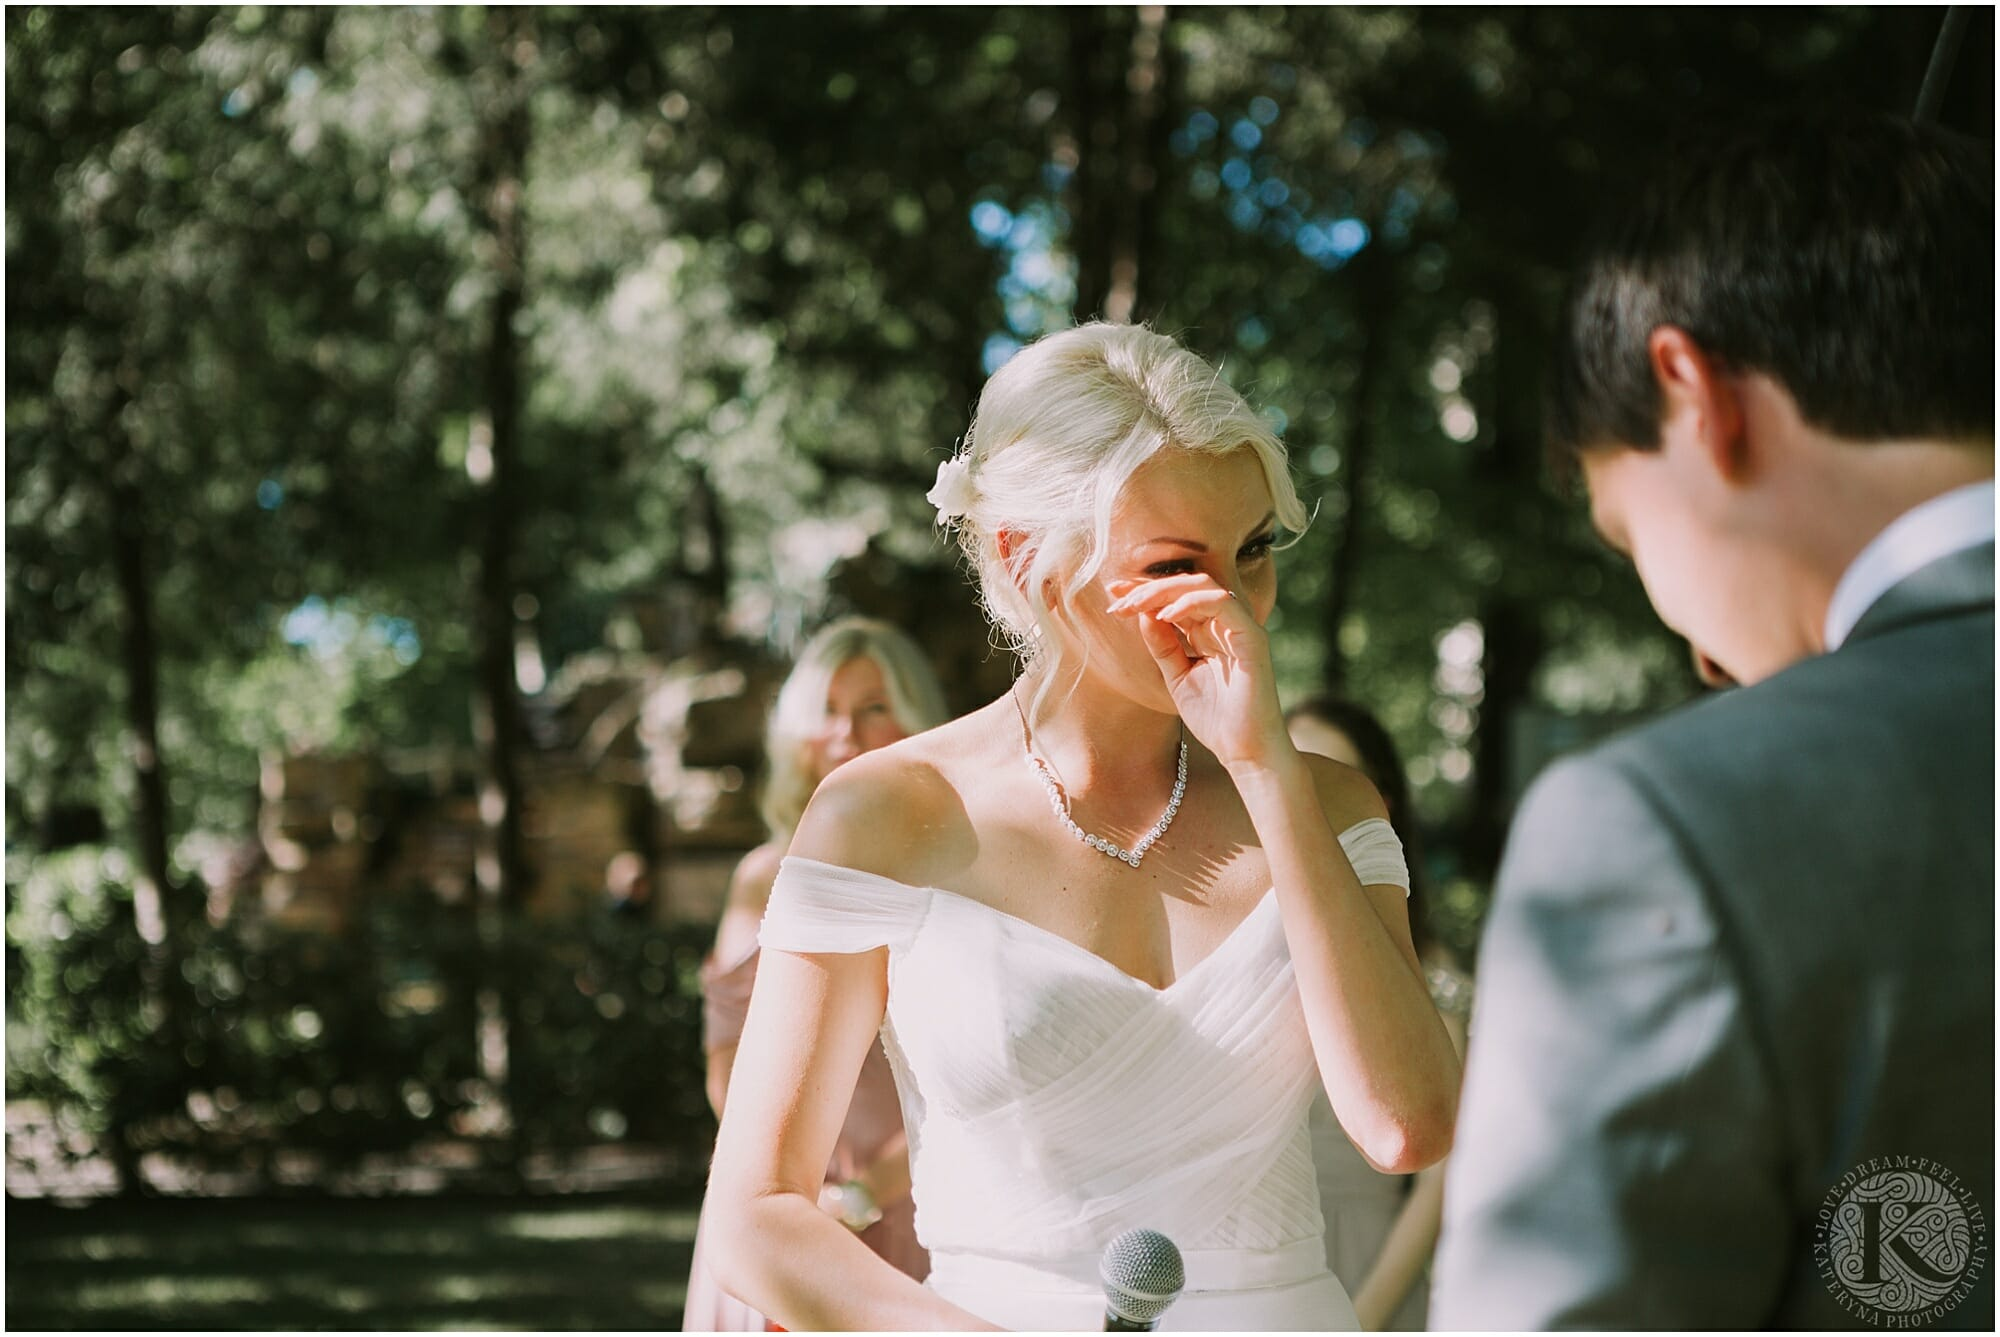 Kateryna-photos-photographe-mariage-chateau-des-3-fontaines-provence-avignon-vaucluse-sud_0054.jpg